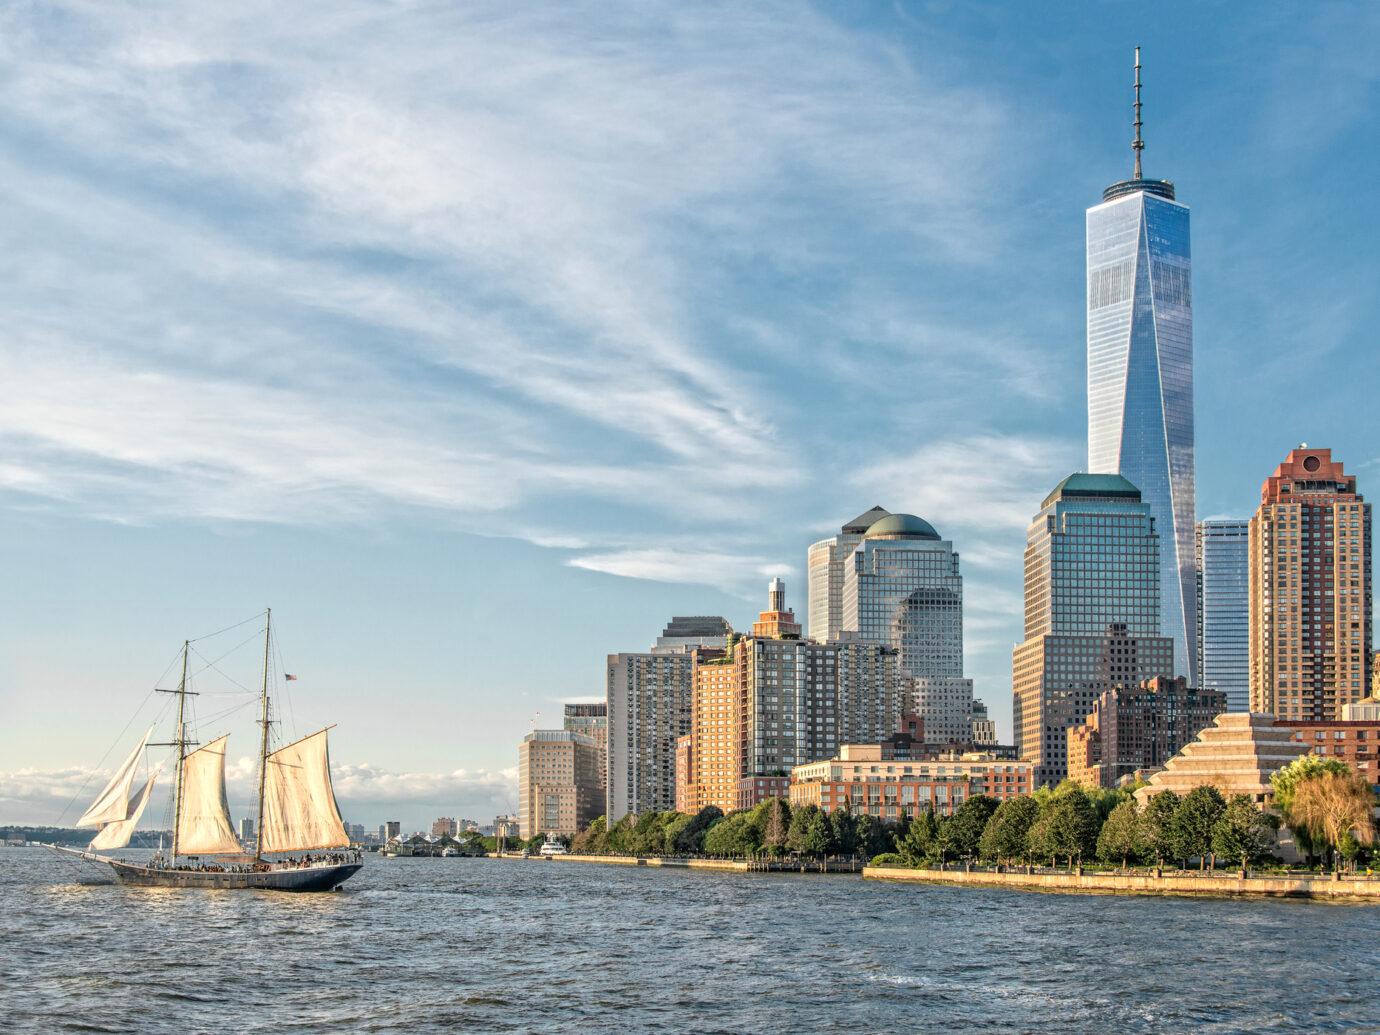 Schooner ship in the harbor new the World Trade Center